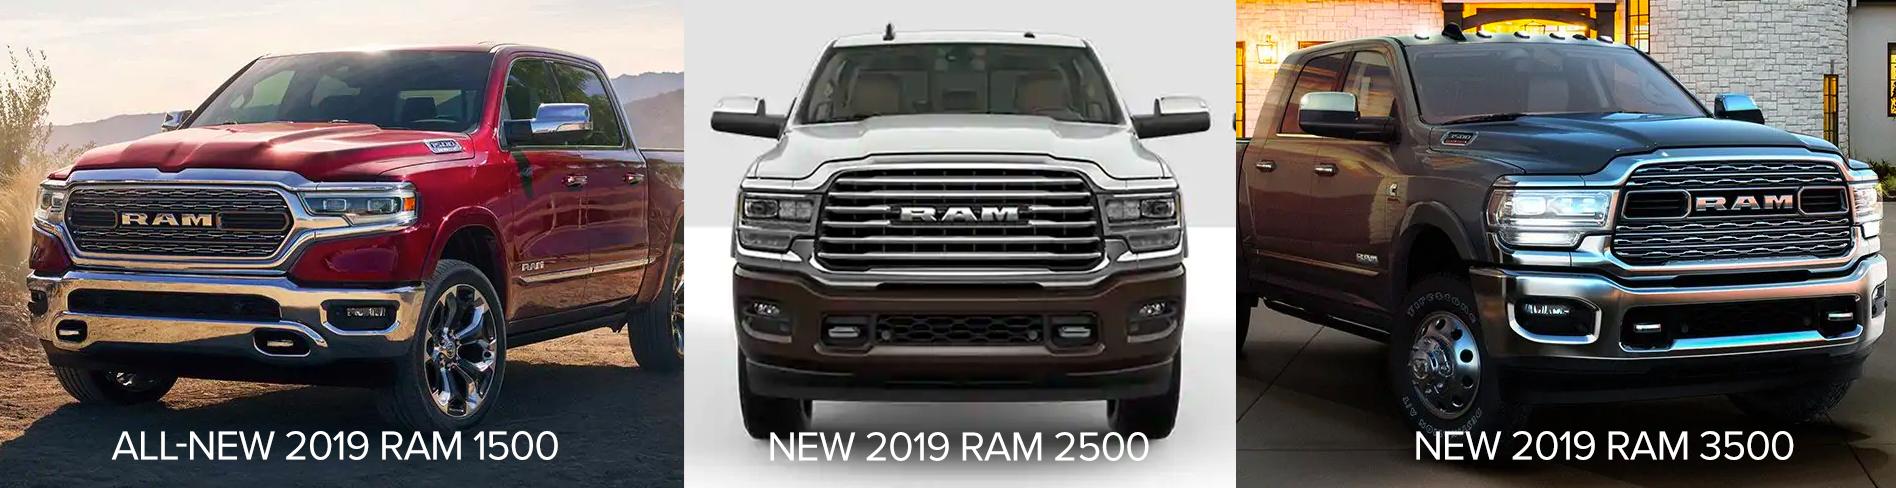 2019 Ram 1500 vs 2500 vs 3500 Chicago IL